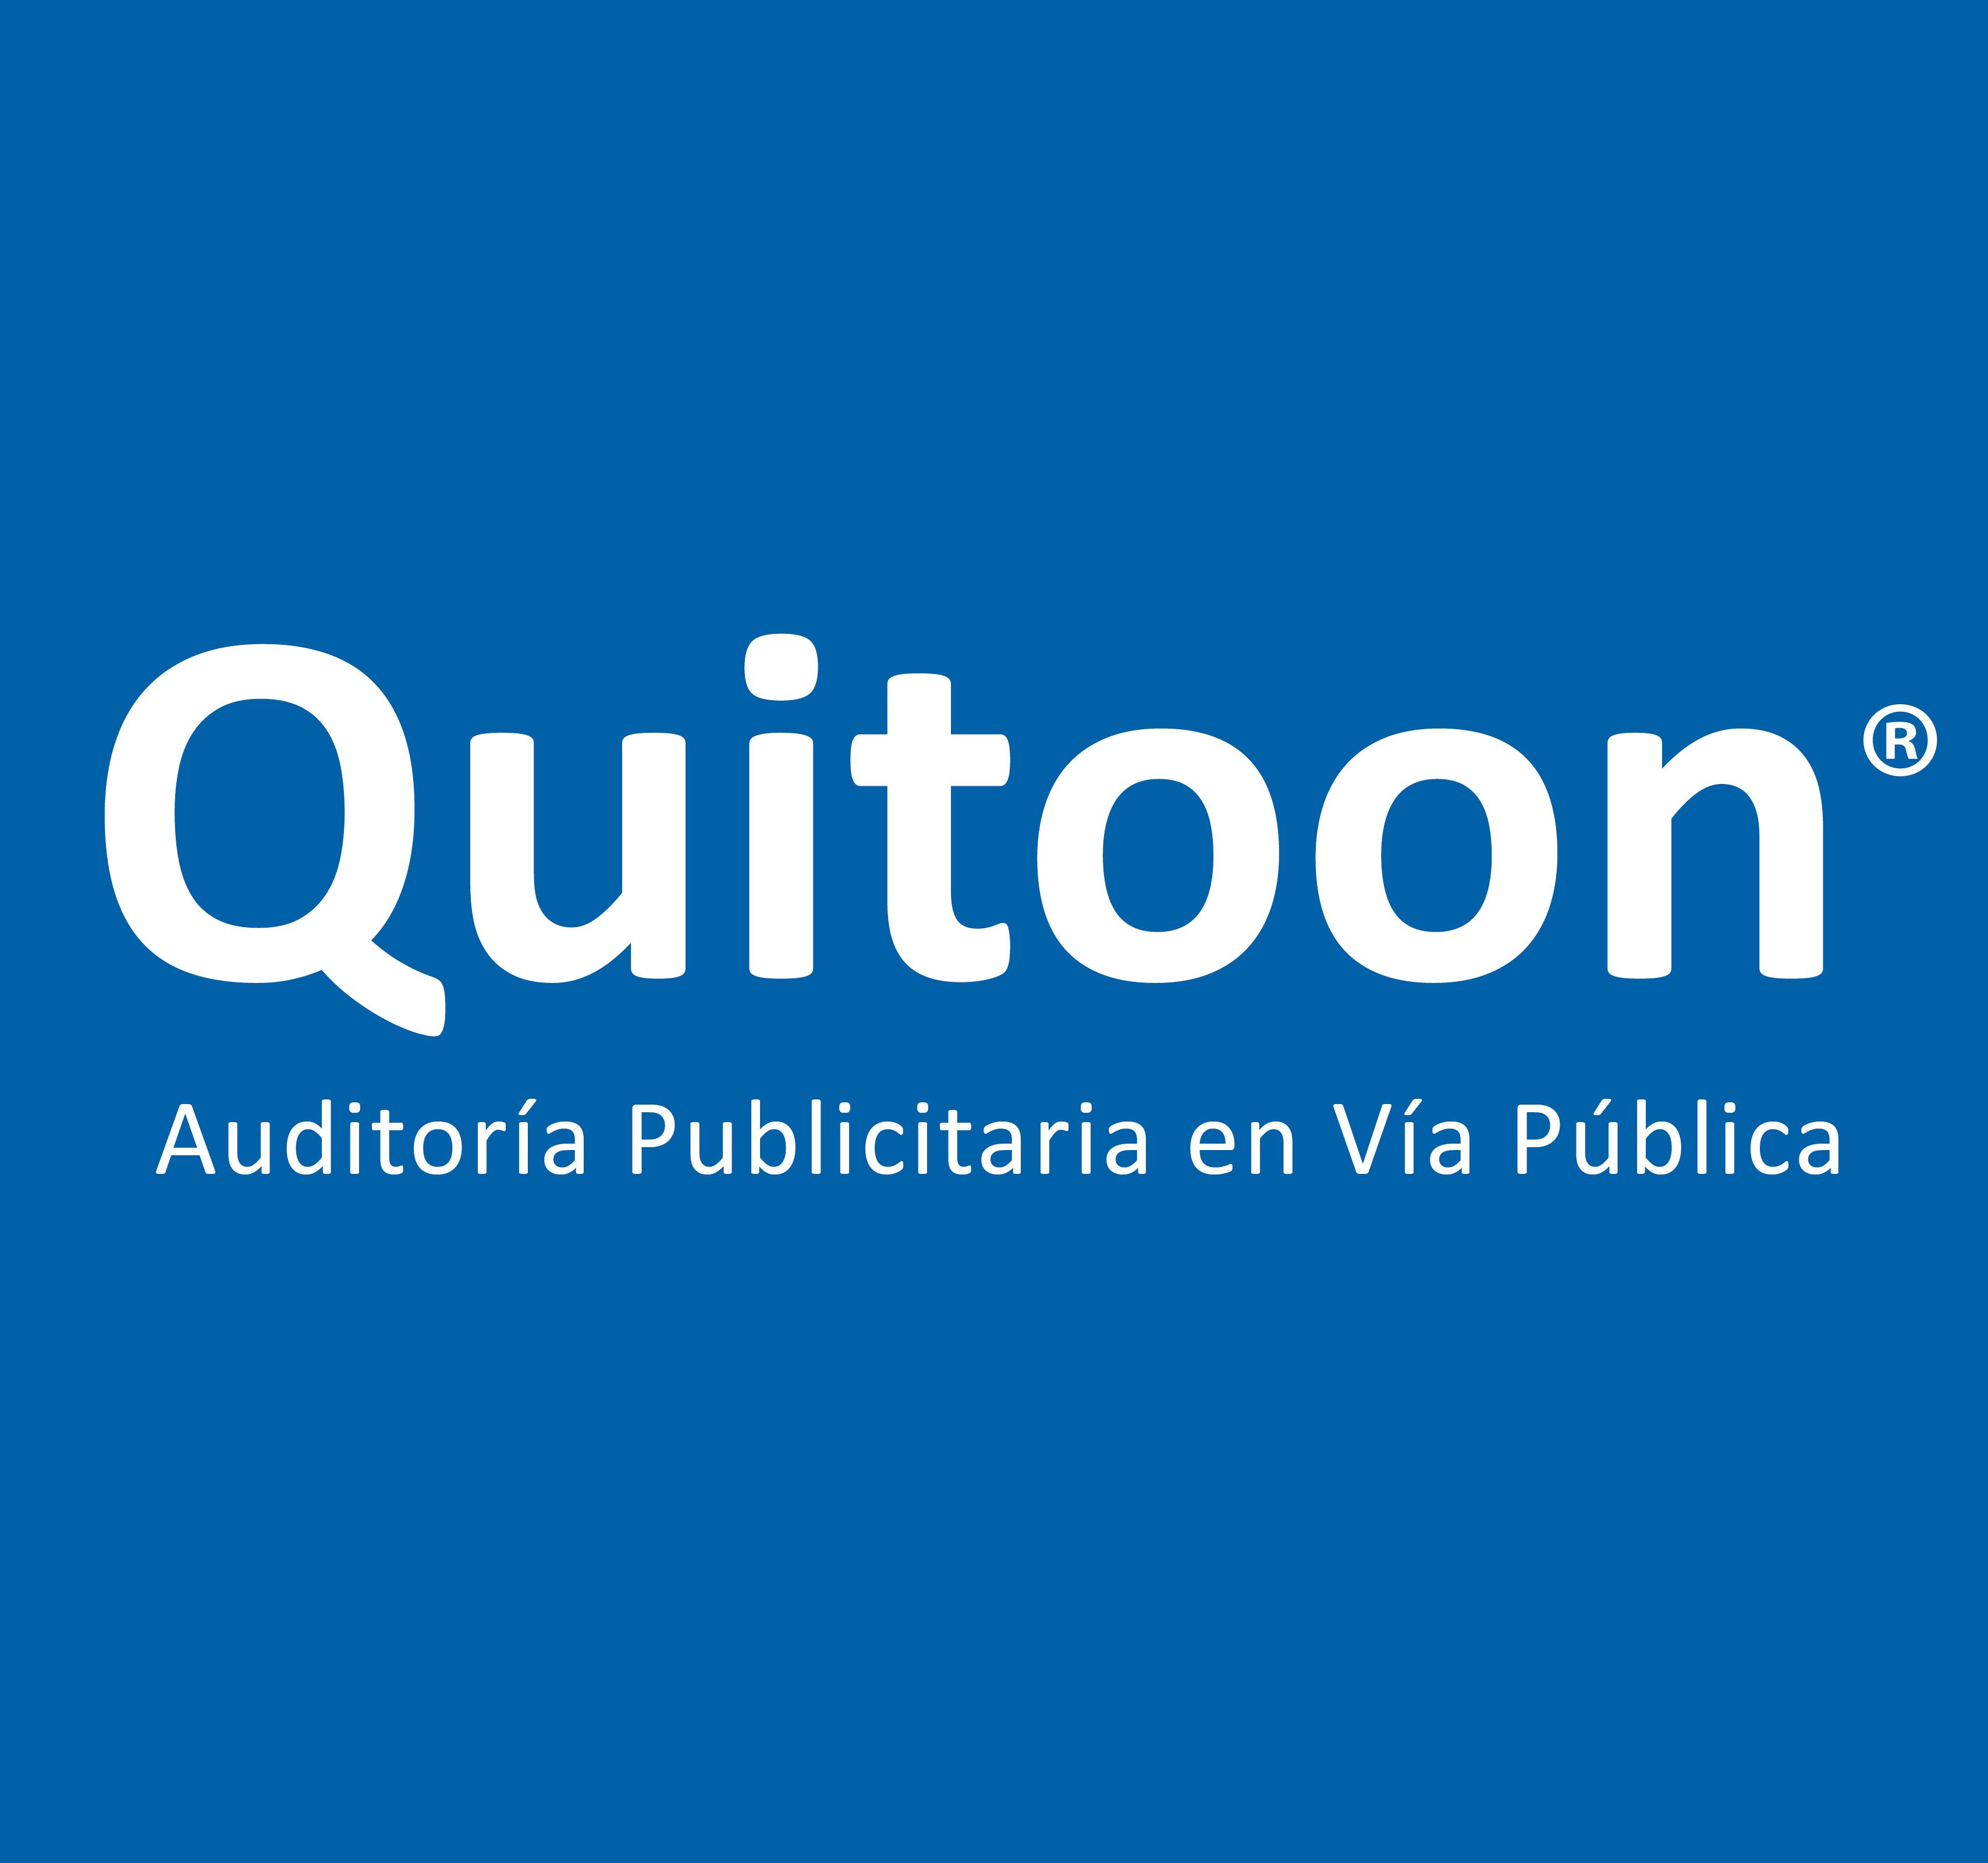 Quitoon